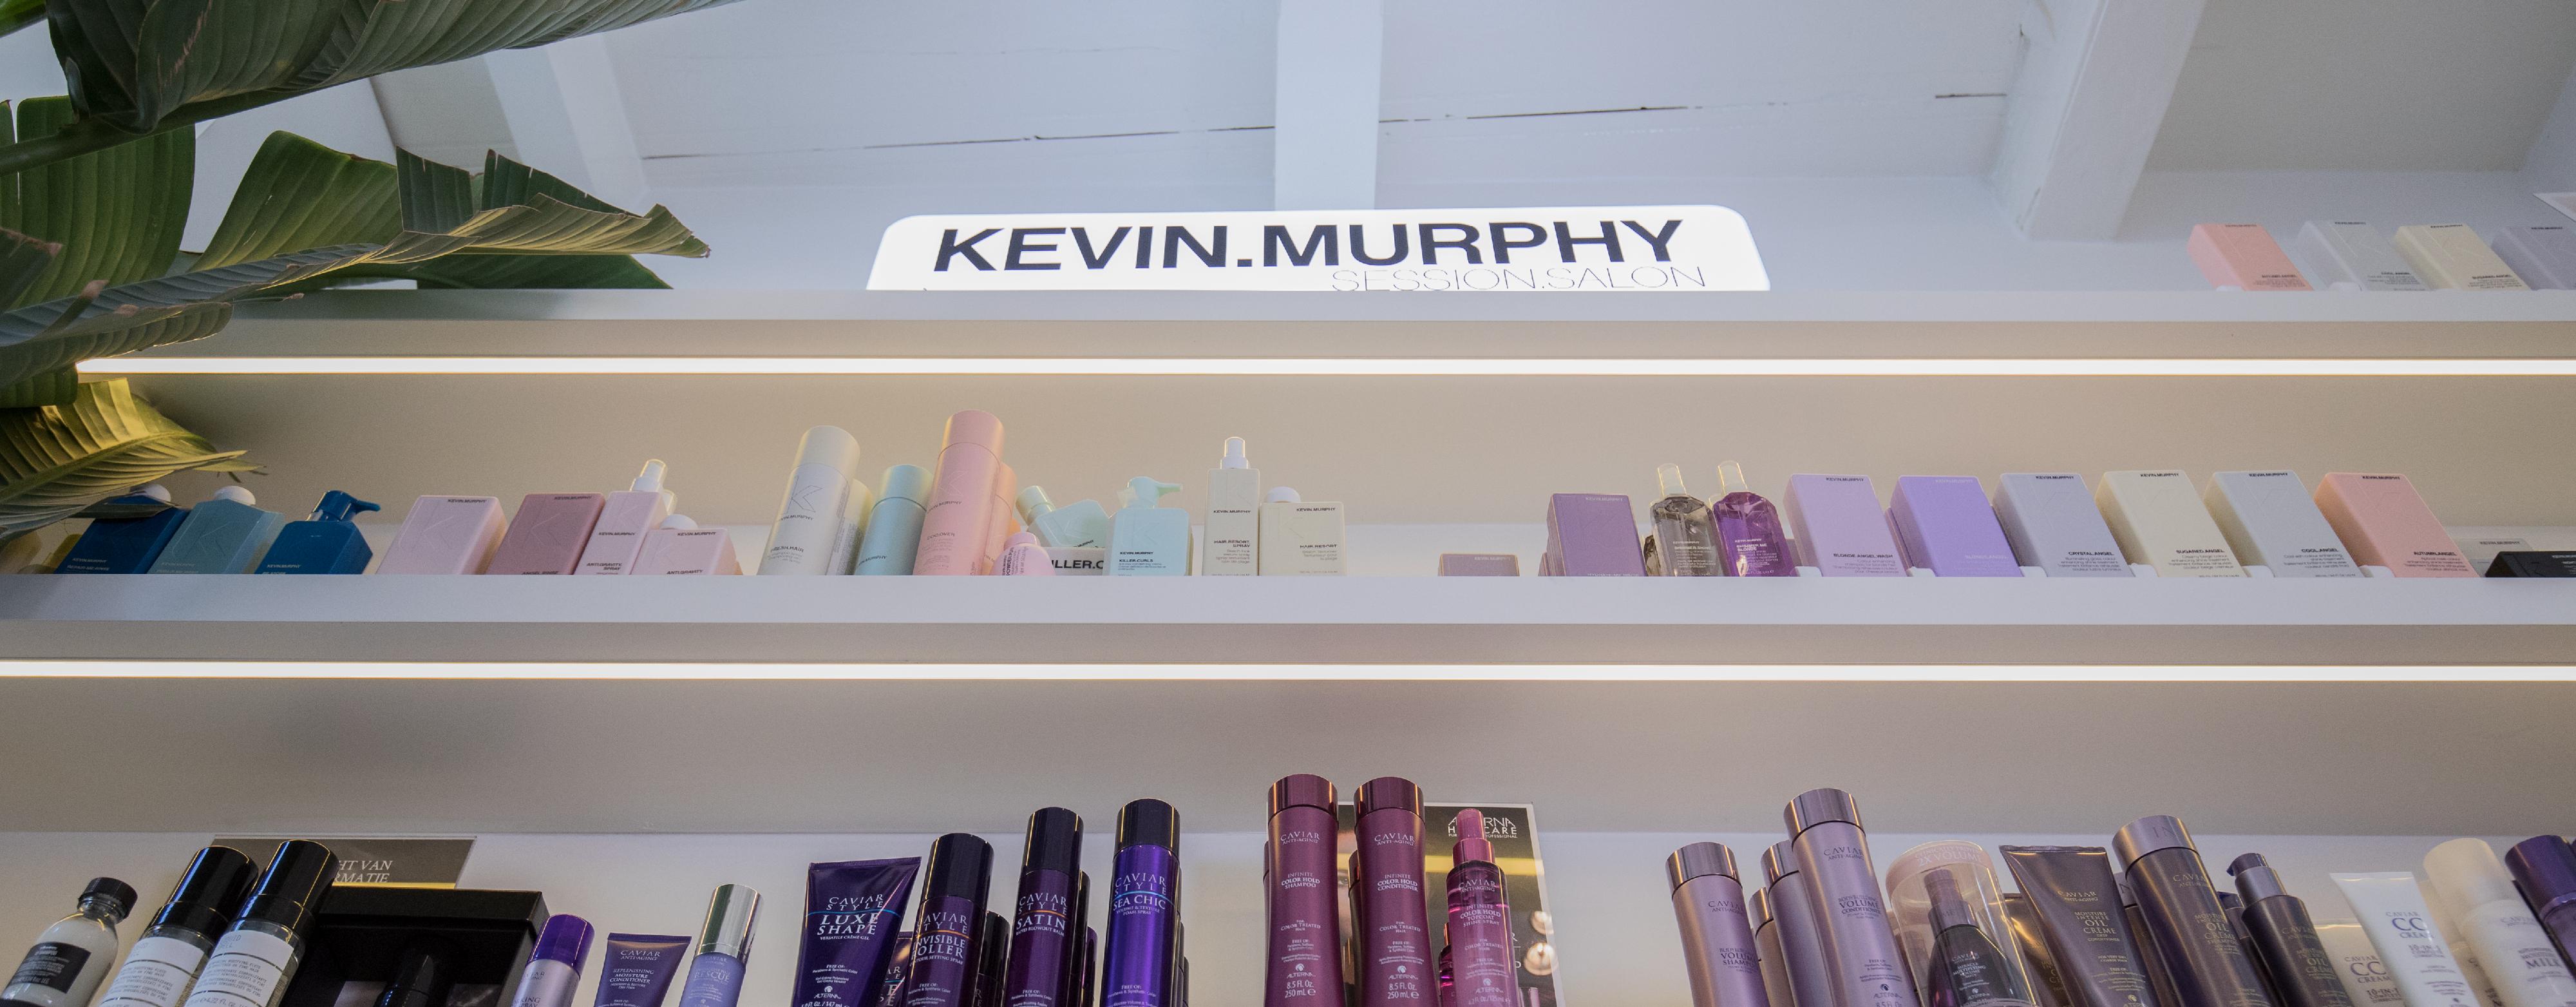 Kevin murphy, belle de jour